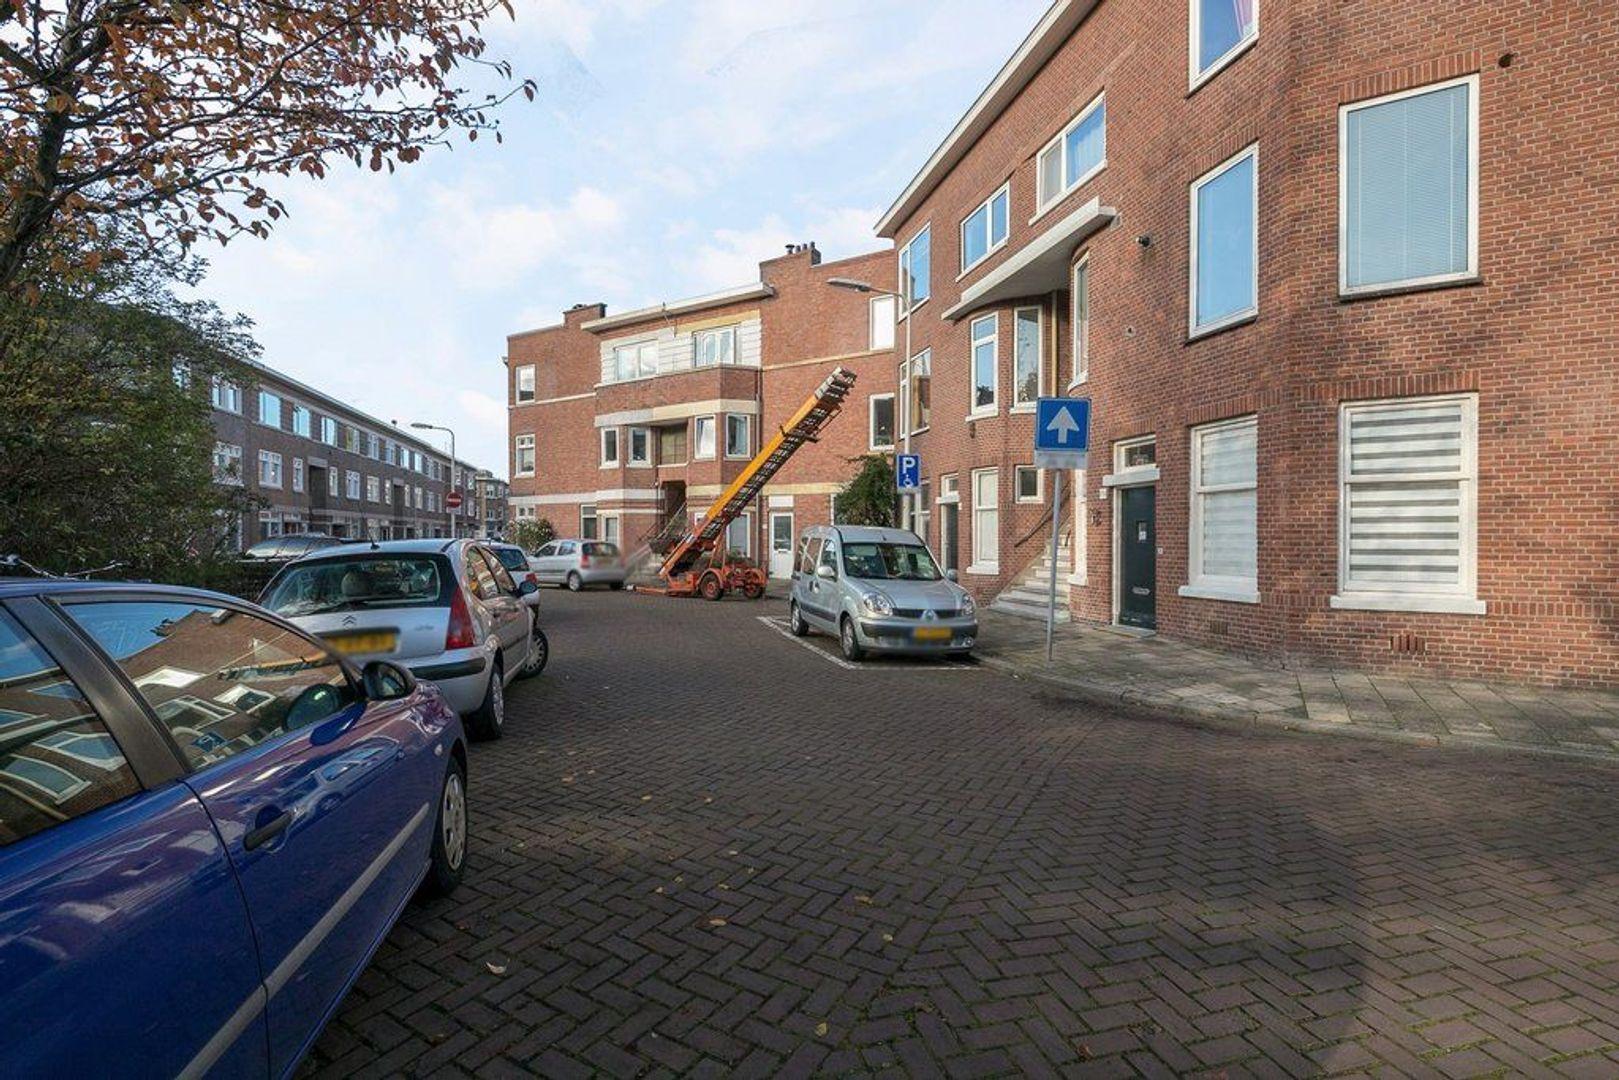 3e Joan Maetsuyckerstraat 226, Den Haag foto-20